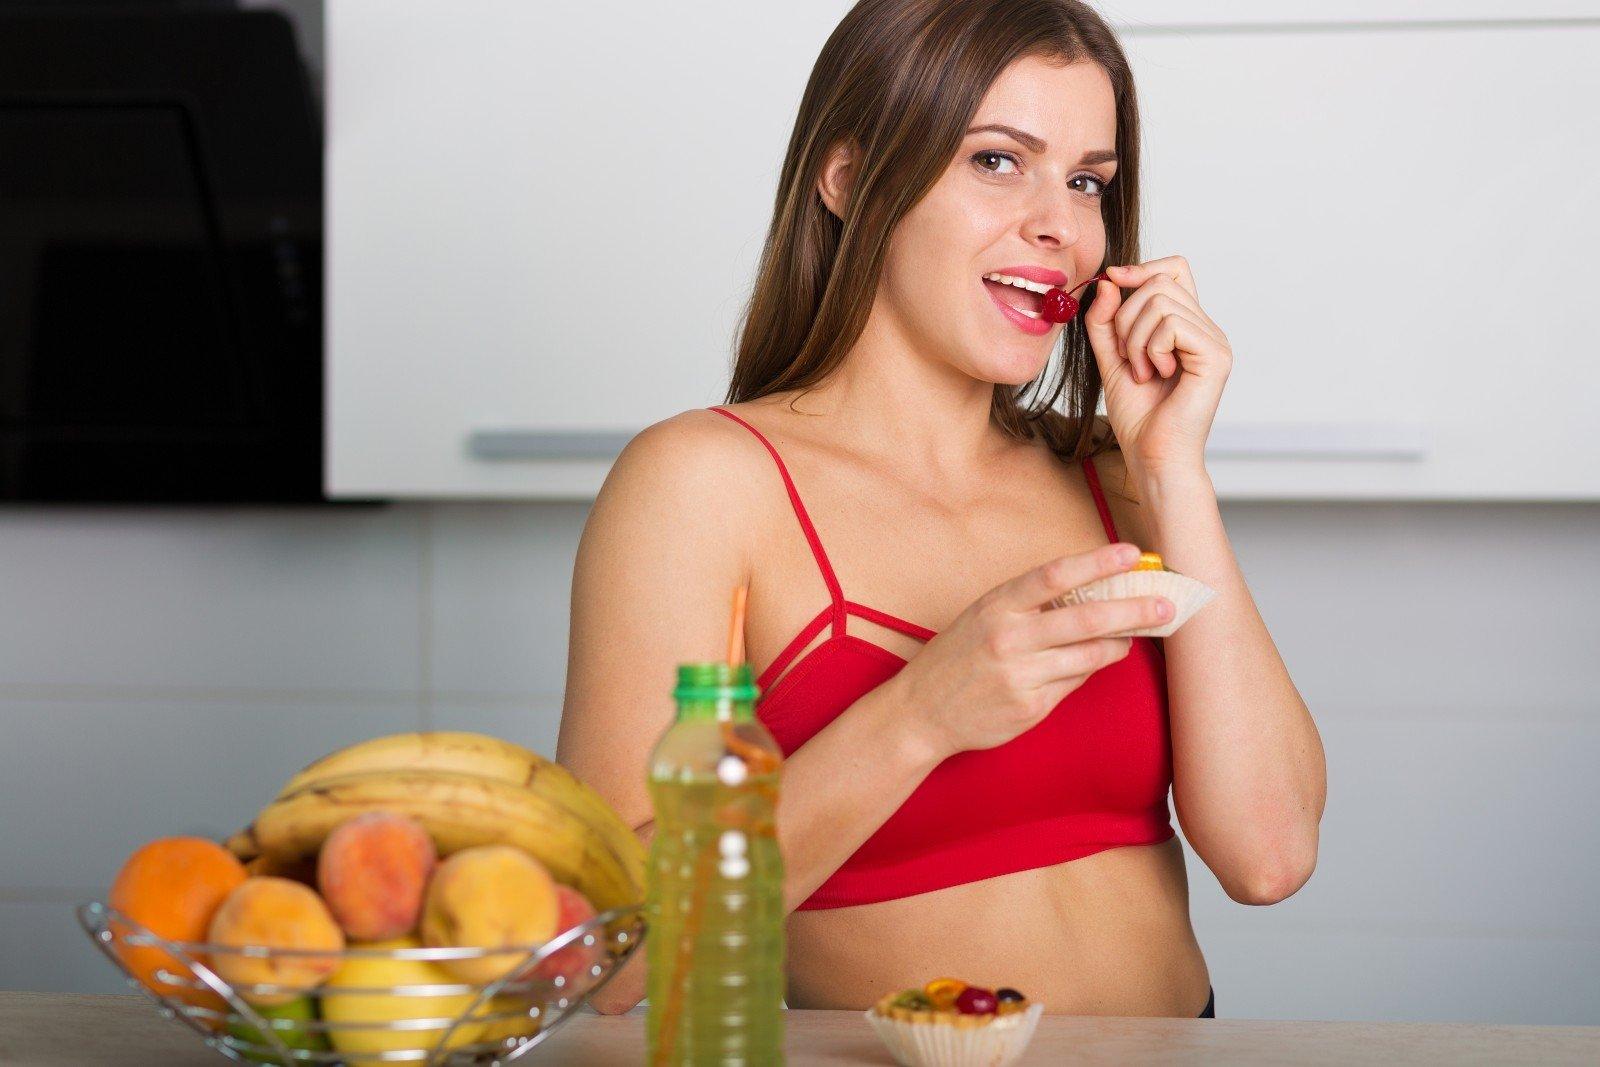 Kaip maitintis sergant hipertonija? | tralistas.lt